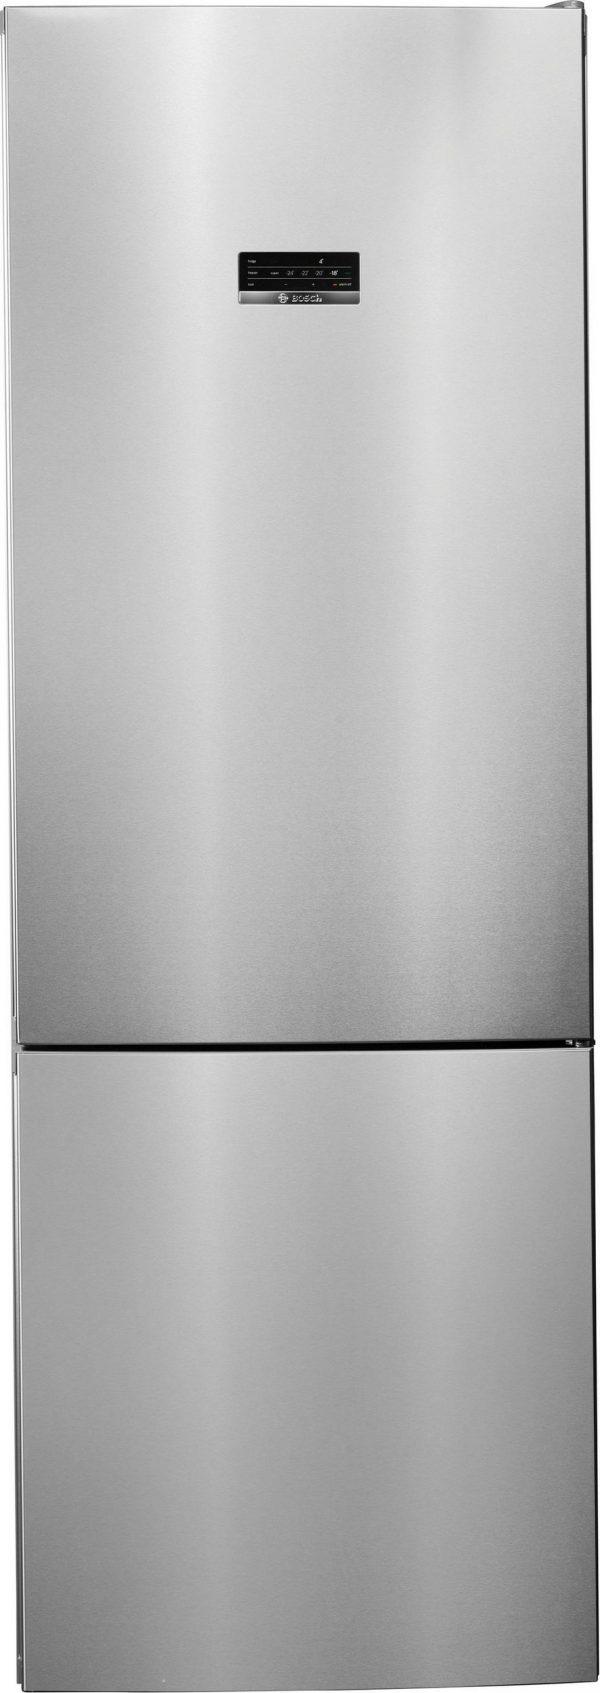 Хладилник BOSCH KGN49XIEA